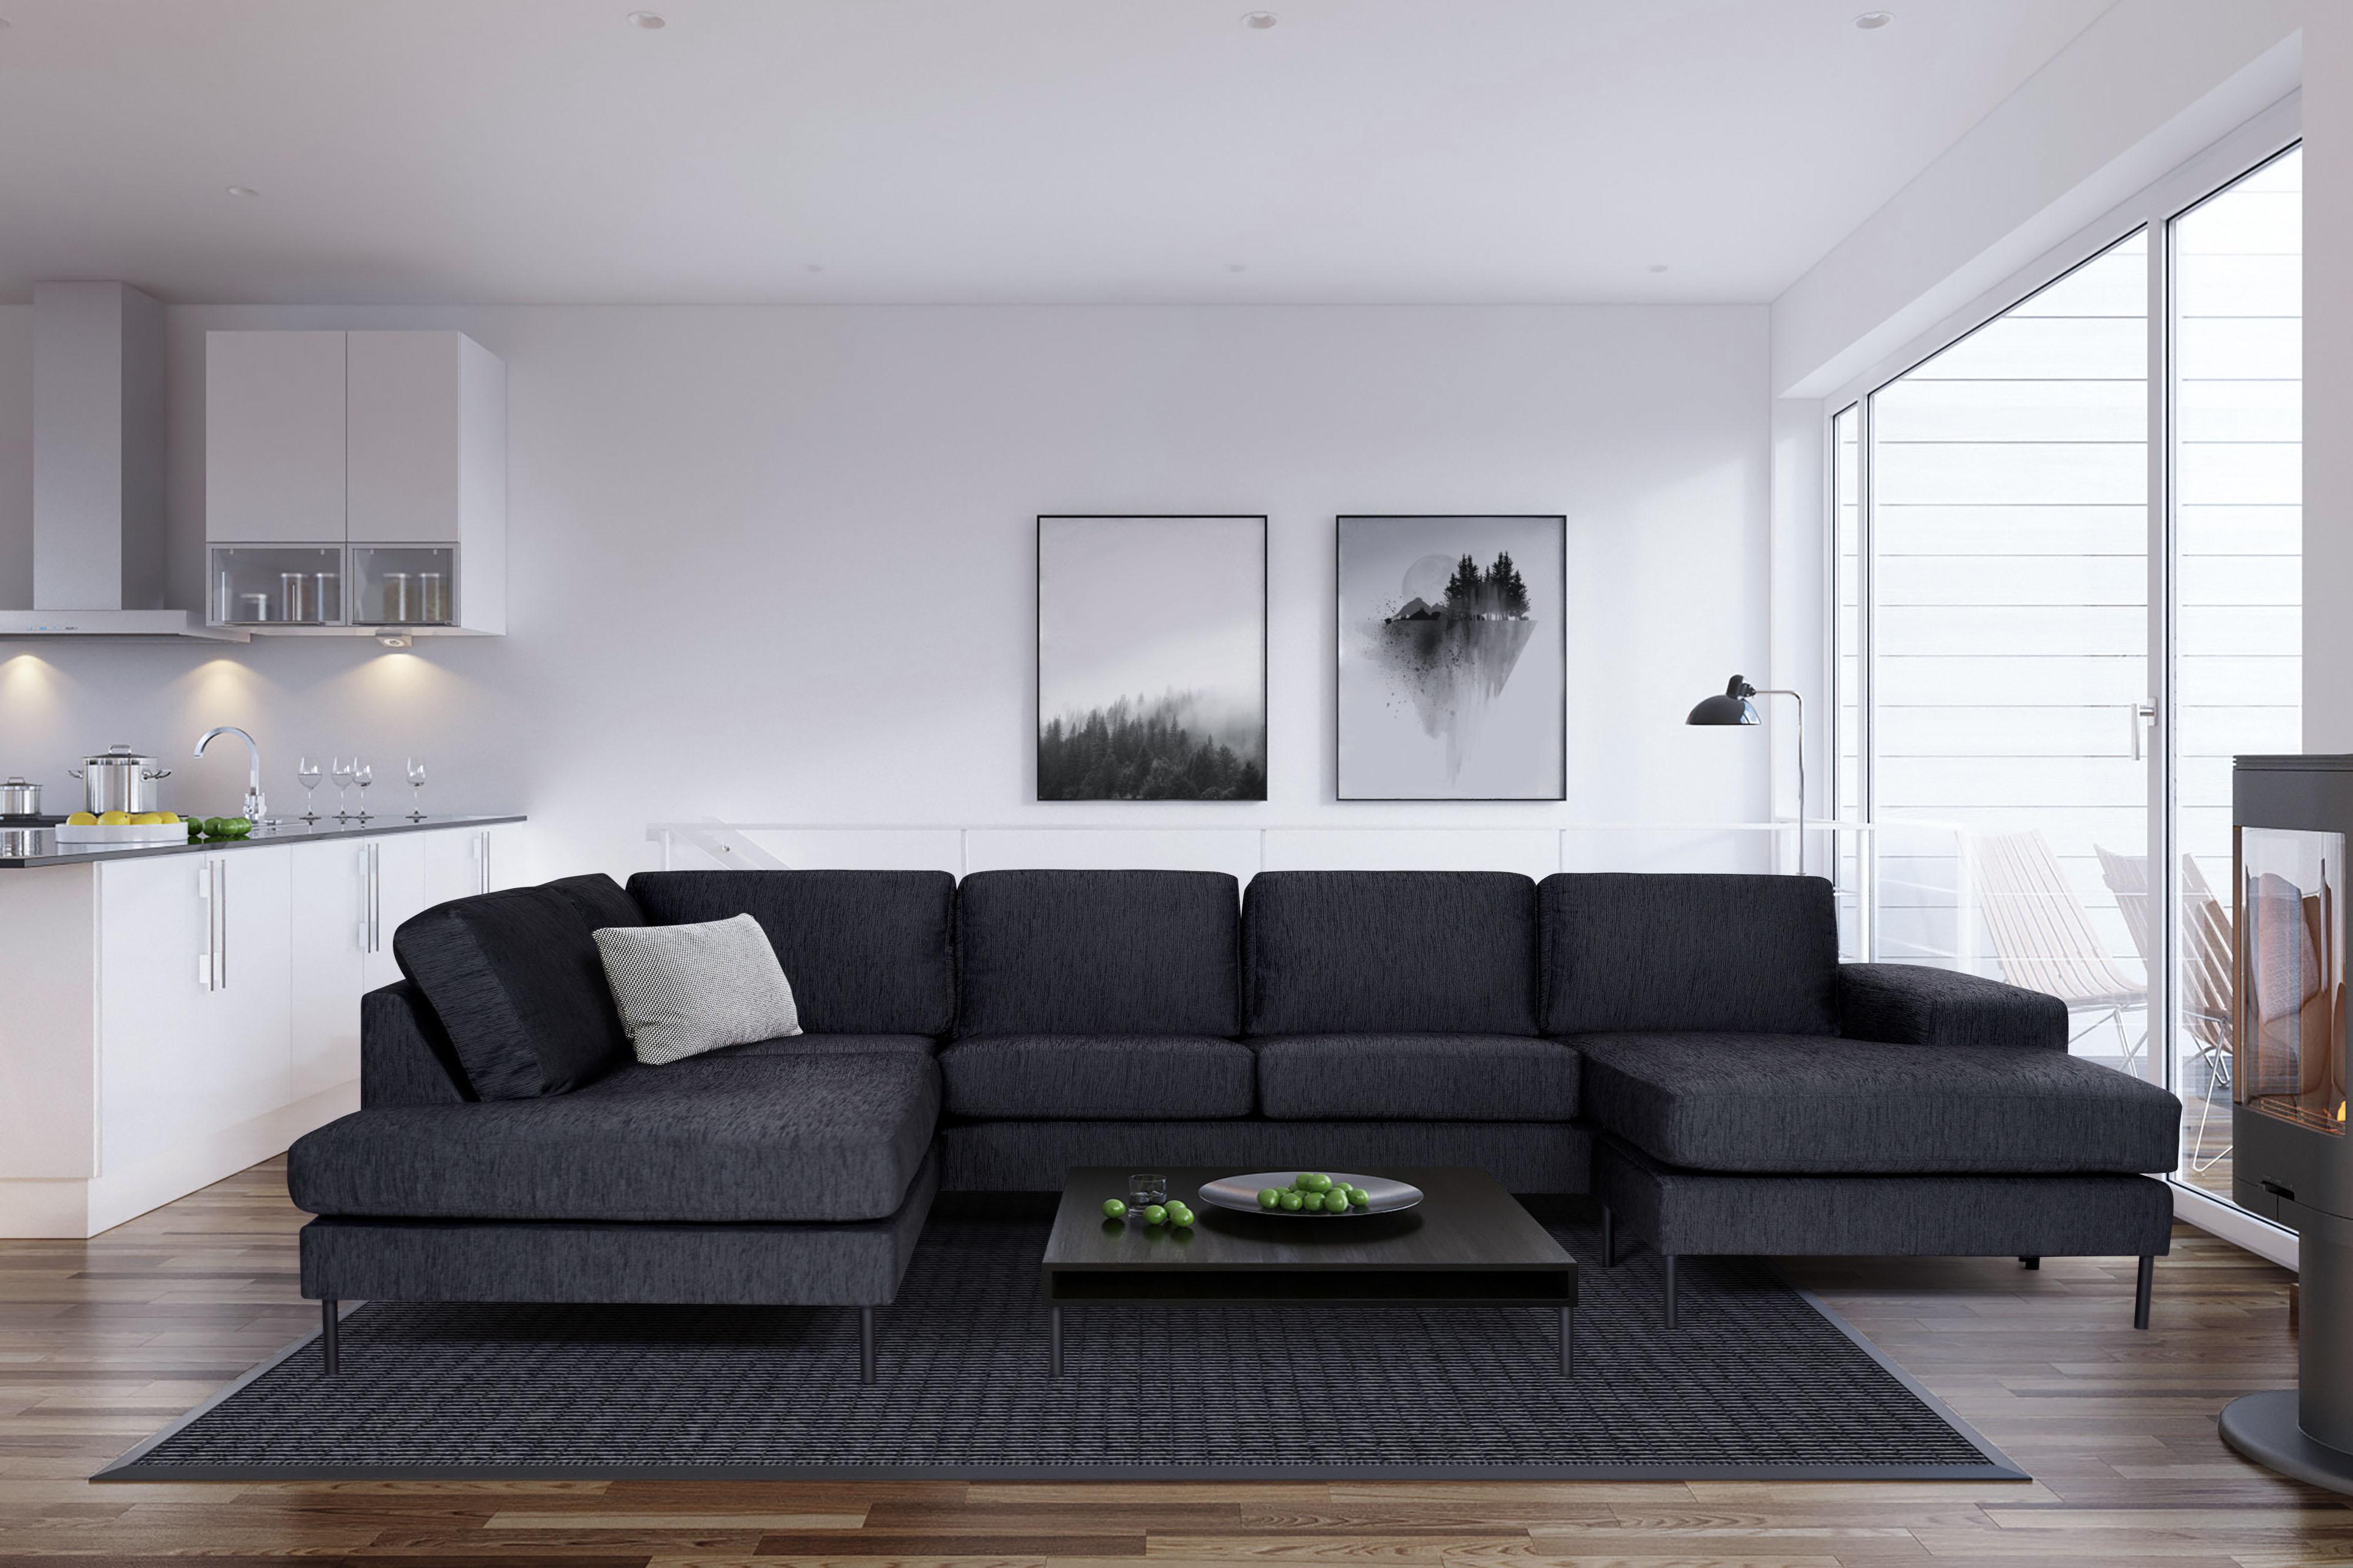 u sofa jonas elegantes zeitloses xxl designer sofa schwarz. Black Bedroom Furniture Sets. Home Design Ideas